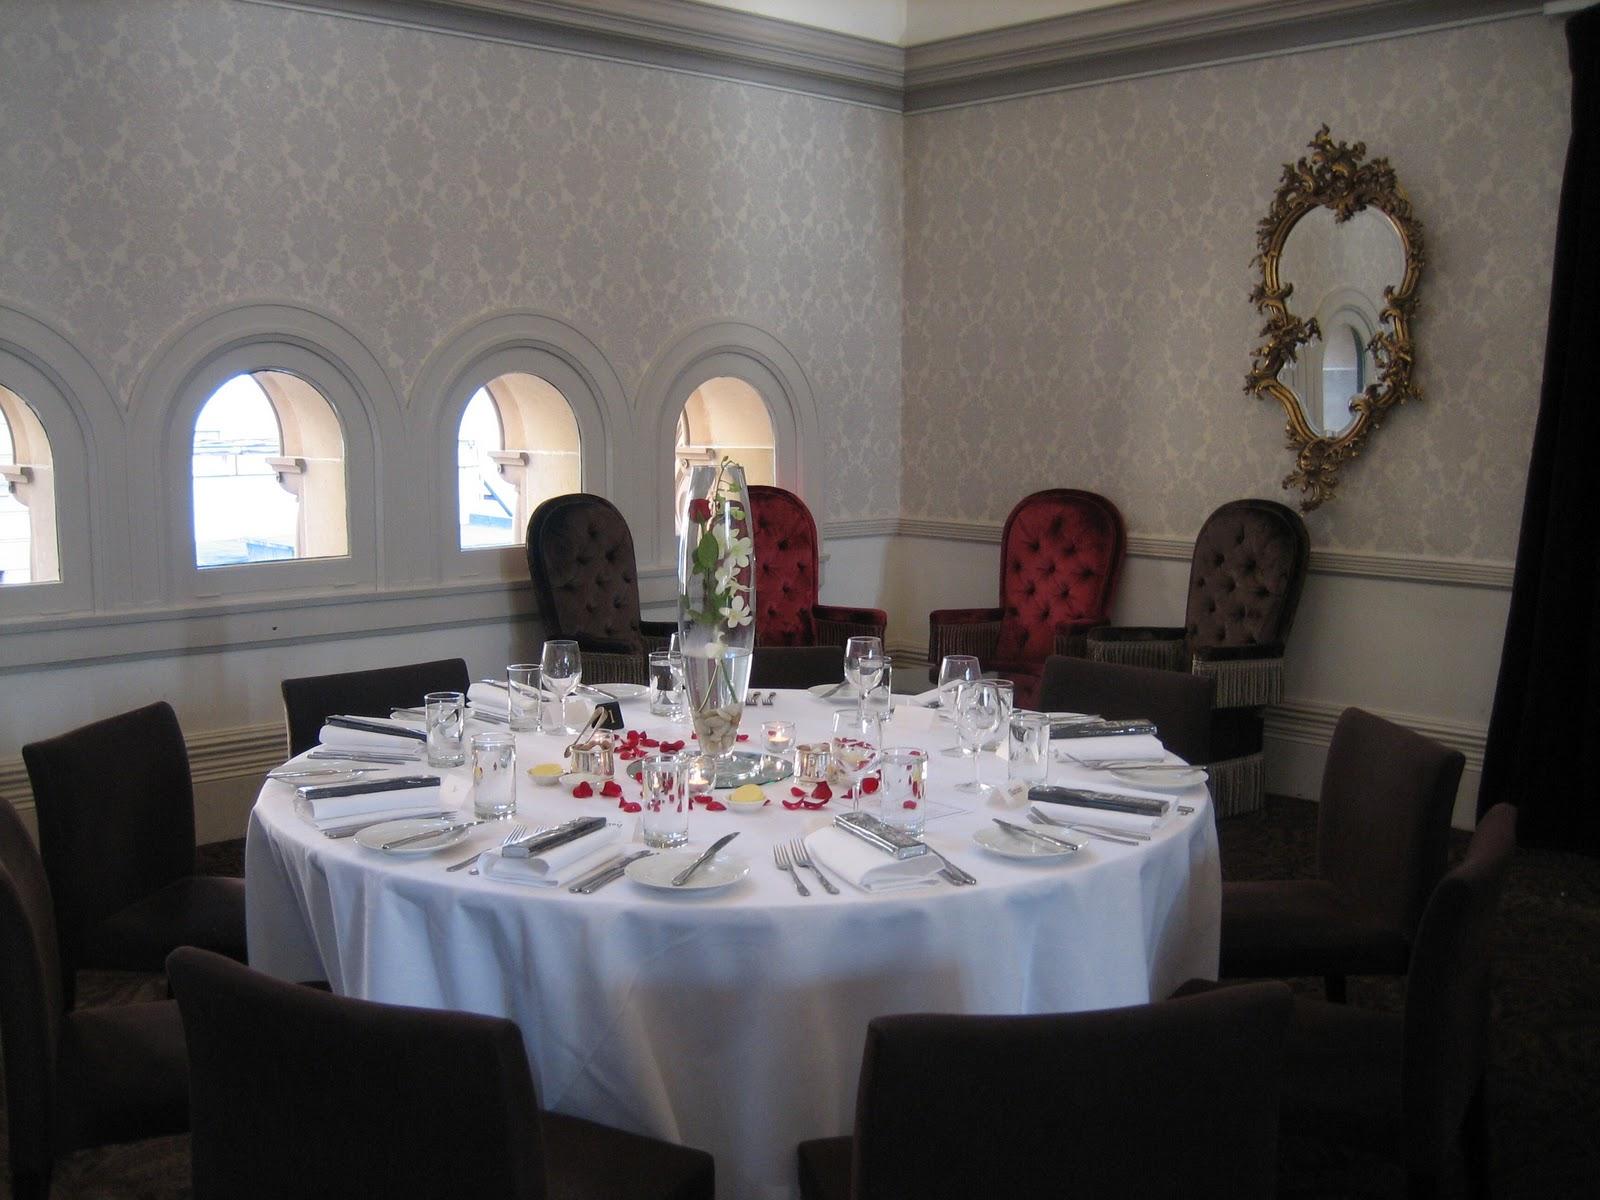 The wedding lookbook wedding reception centrepieces for Wedding reception centrepieces